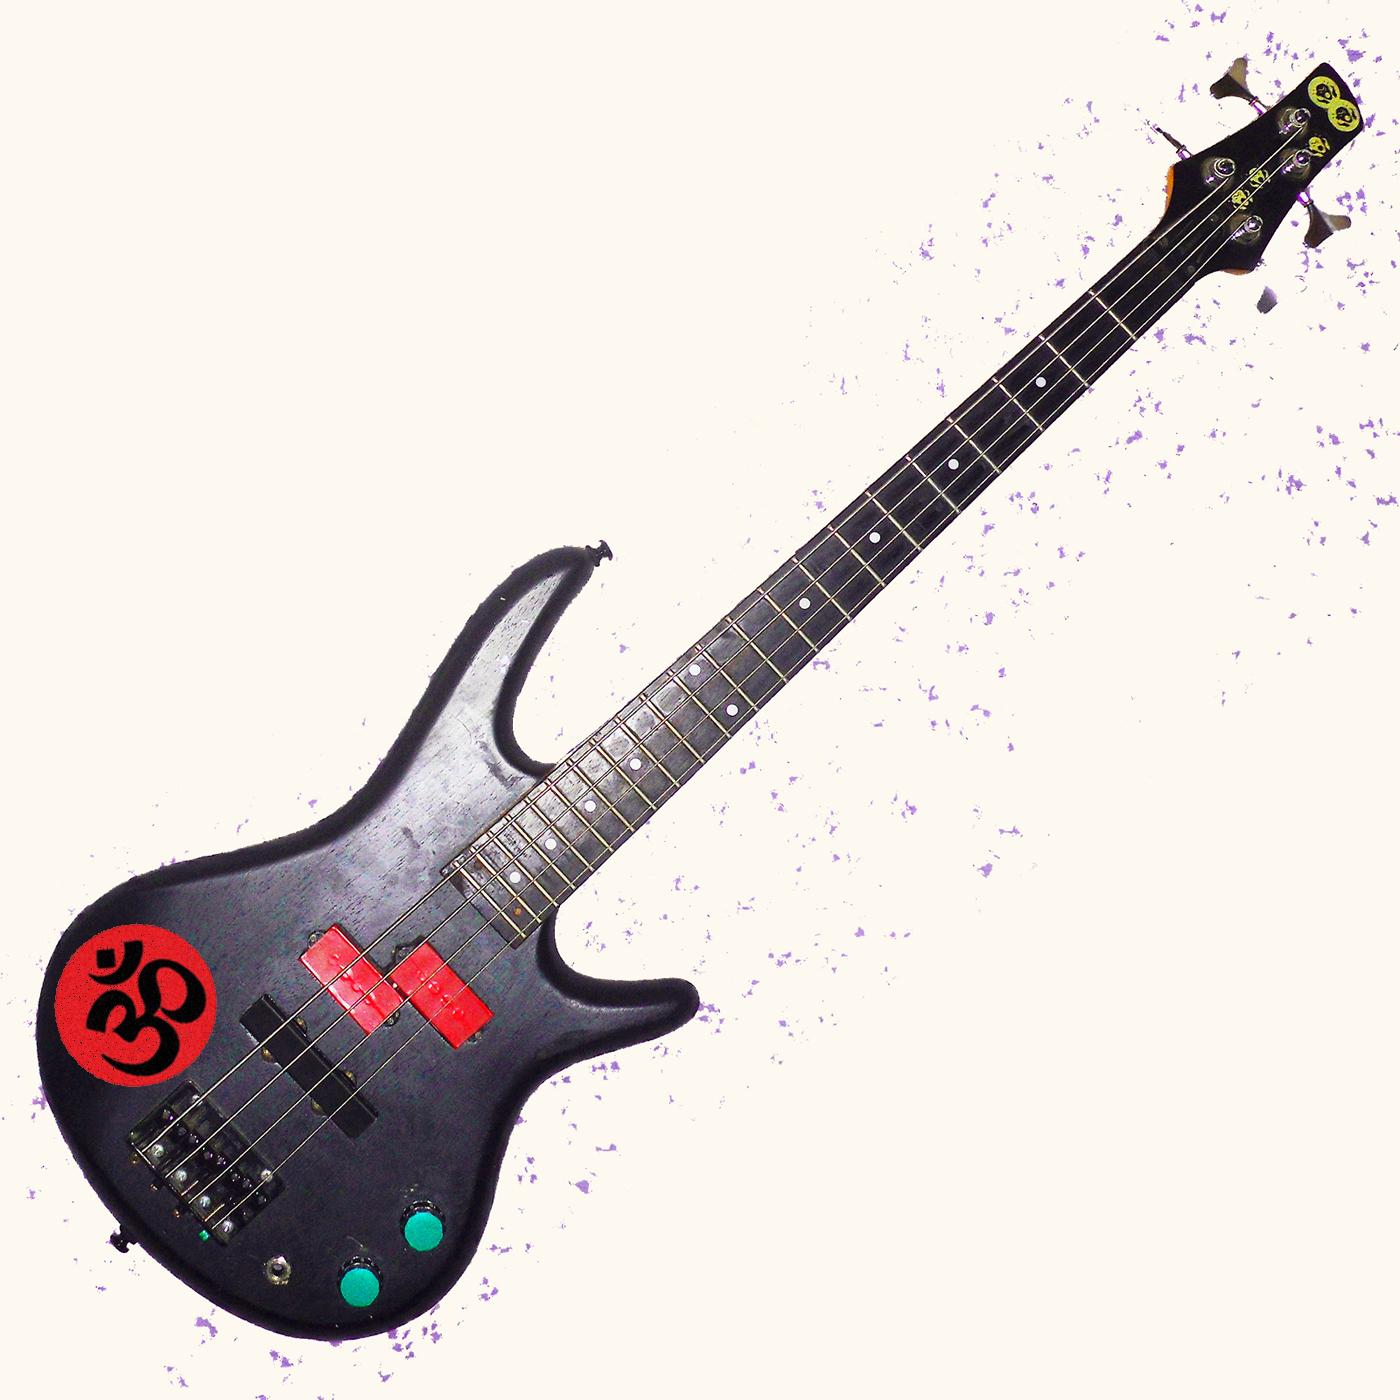 A-Mikro-Bass-120921-smaller-OM-Decal-cop